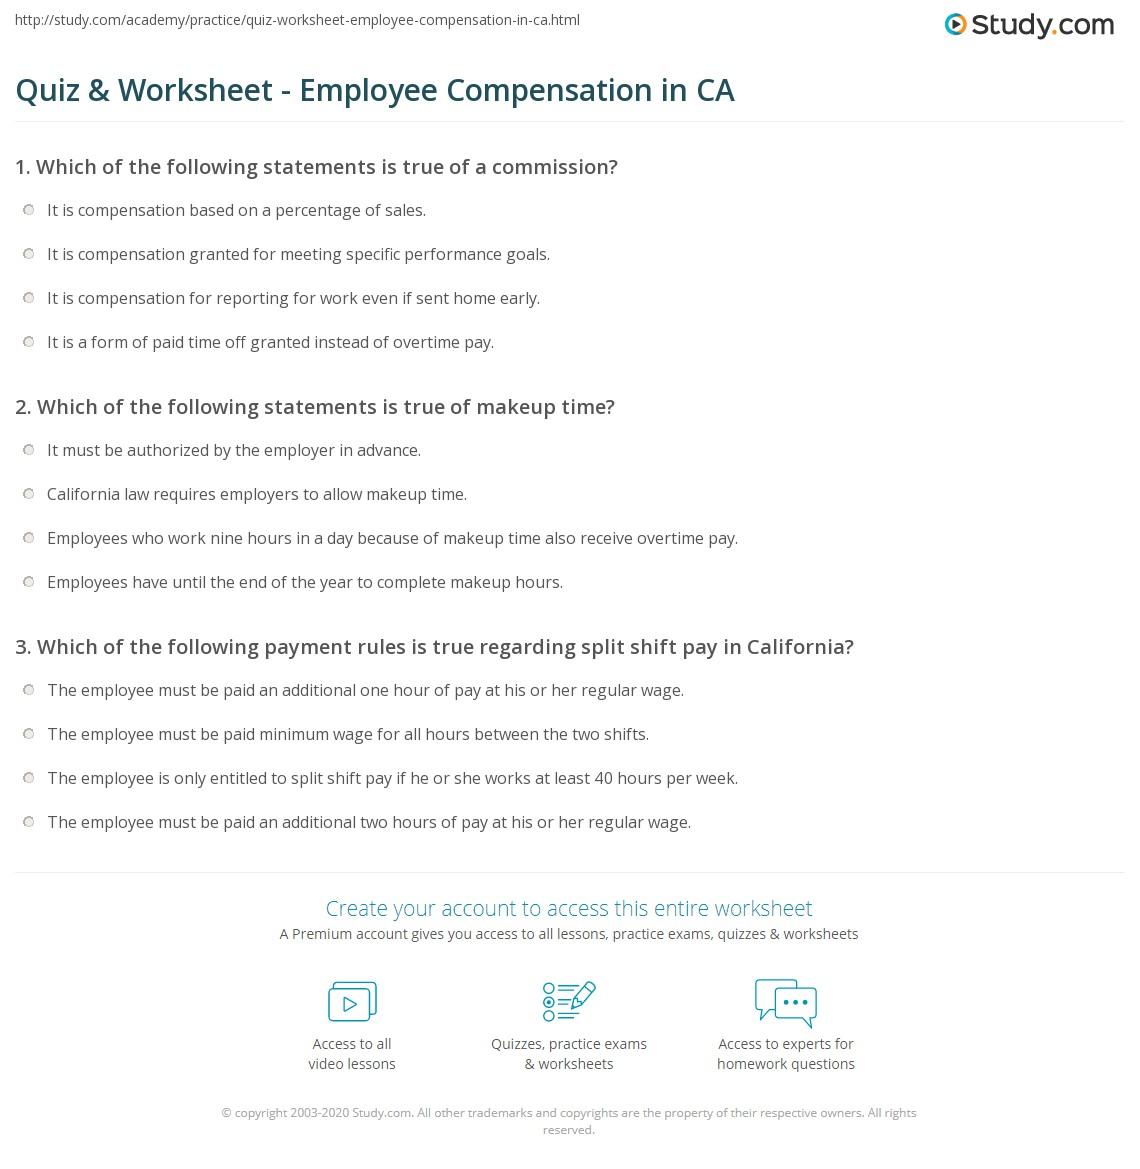 quiz worksheet employee compensation in ca. Black Bedroom Furniture Sets. Home Design Ideas